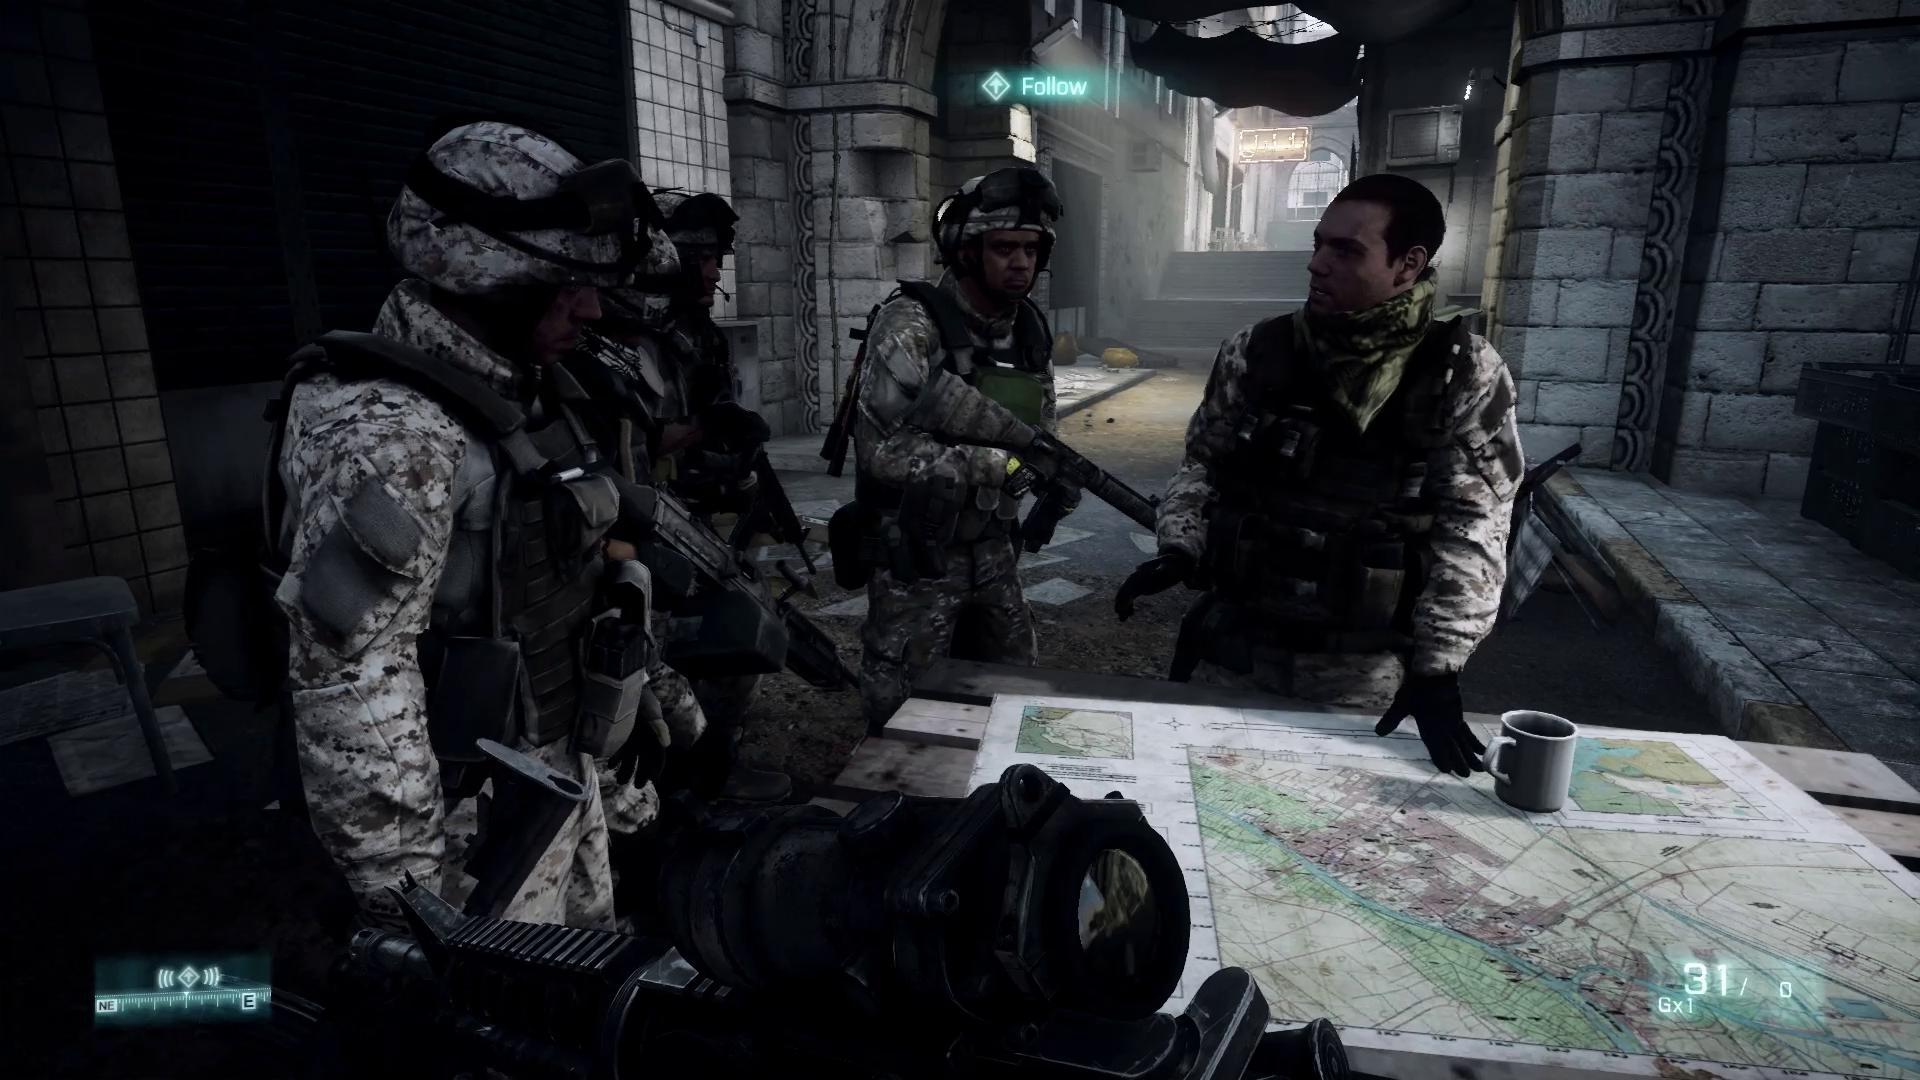 Battlefield 3 Media - Battlefield 3 - GameReplays.org